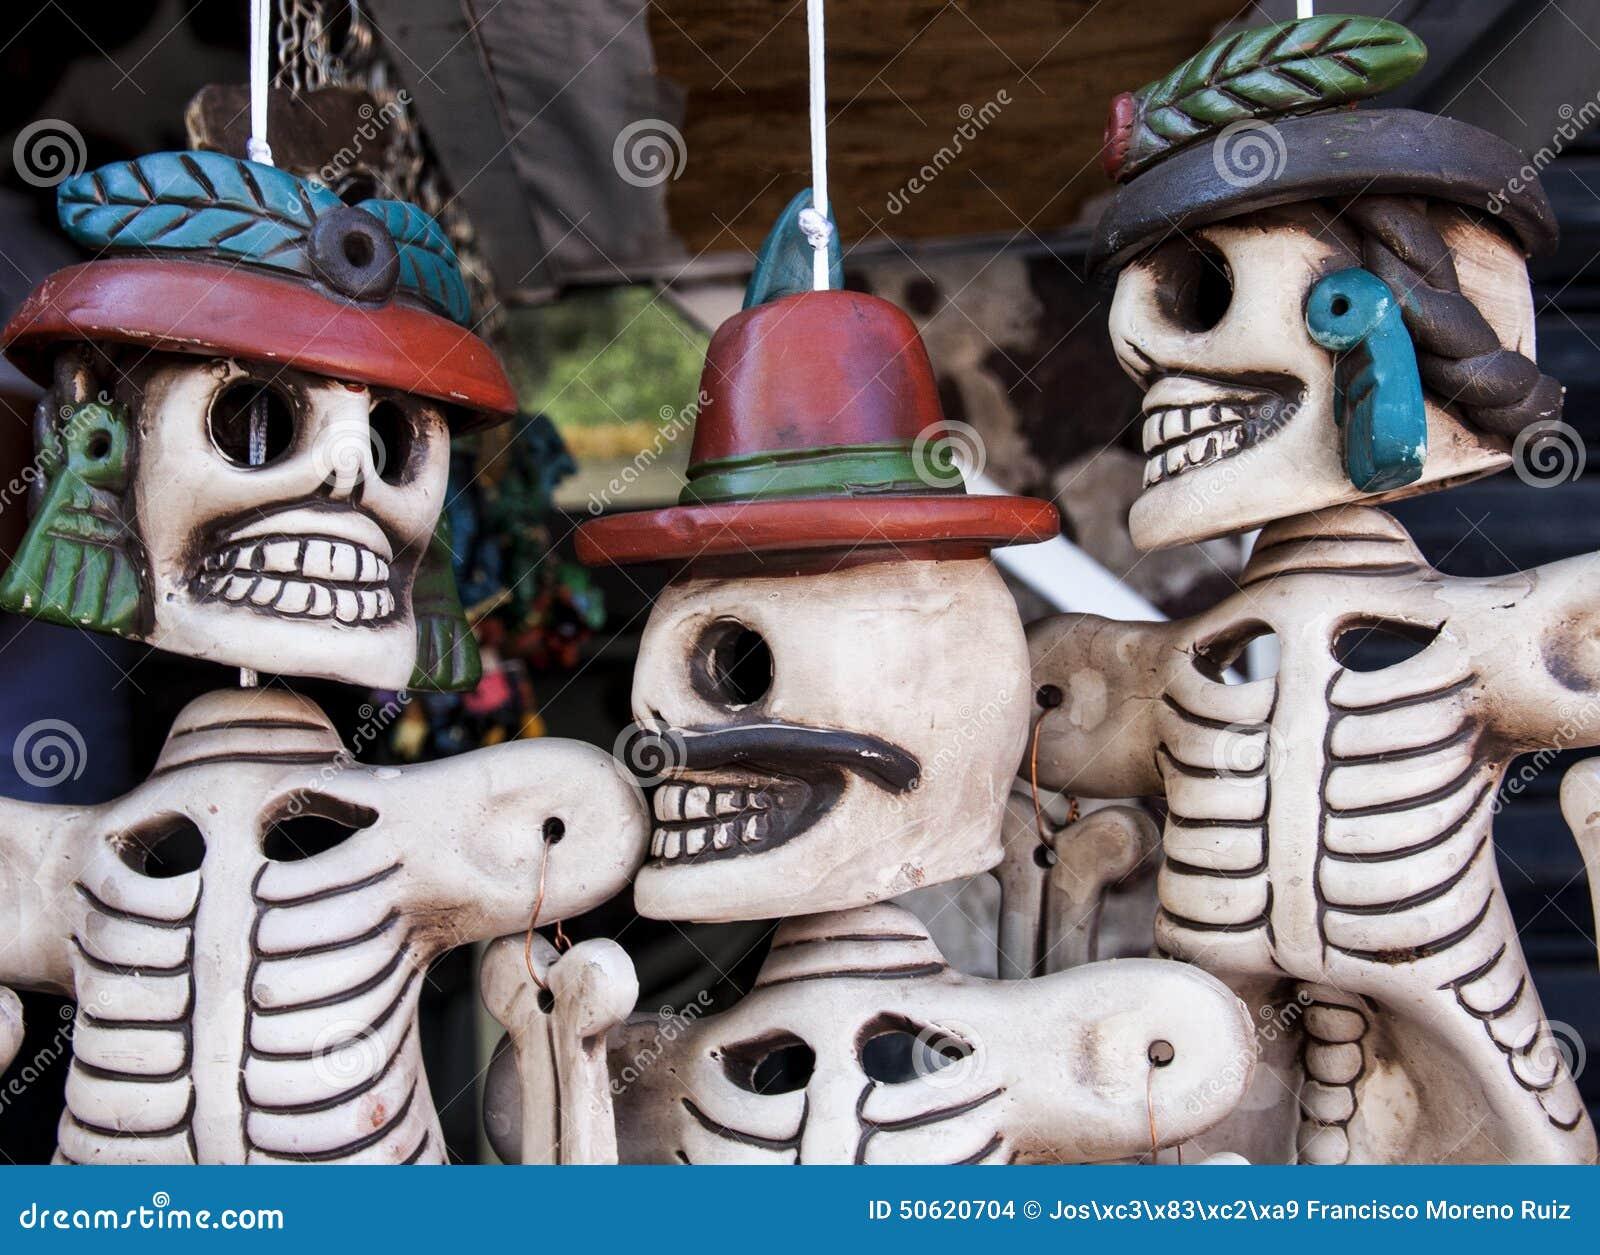 Calaveras Mexicanas 1 Stock Photo Image Of Teotihuacán 50620704